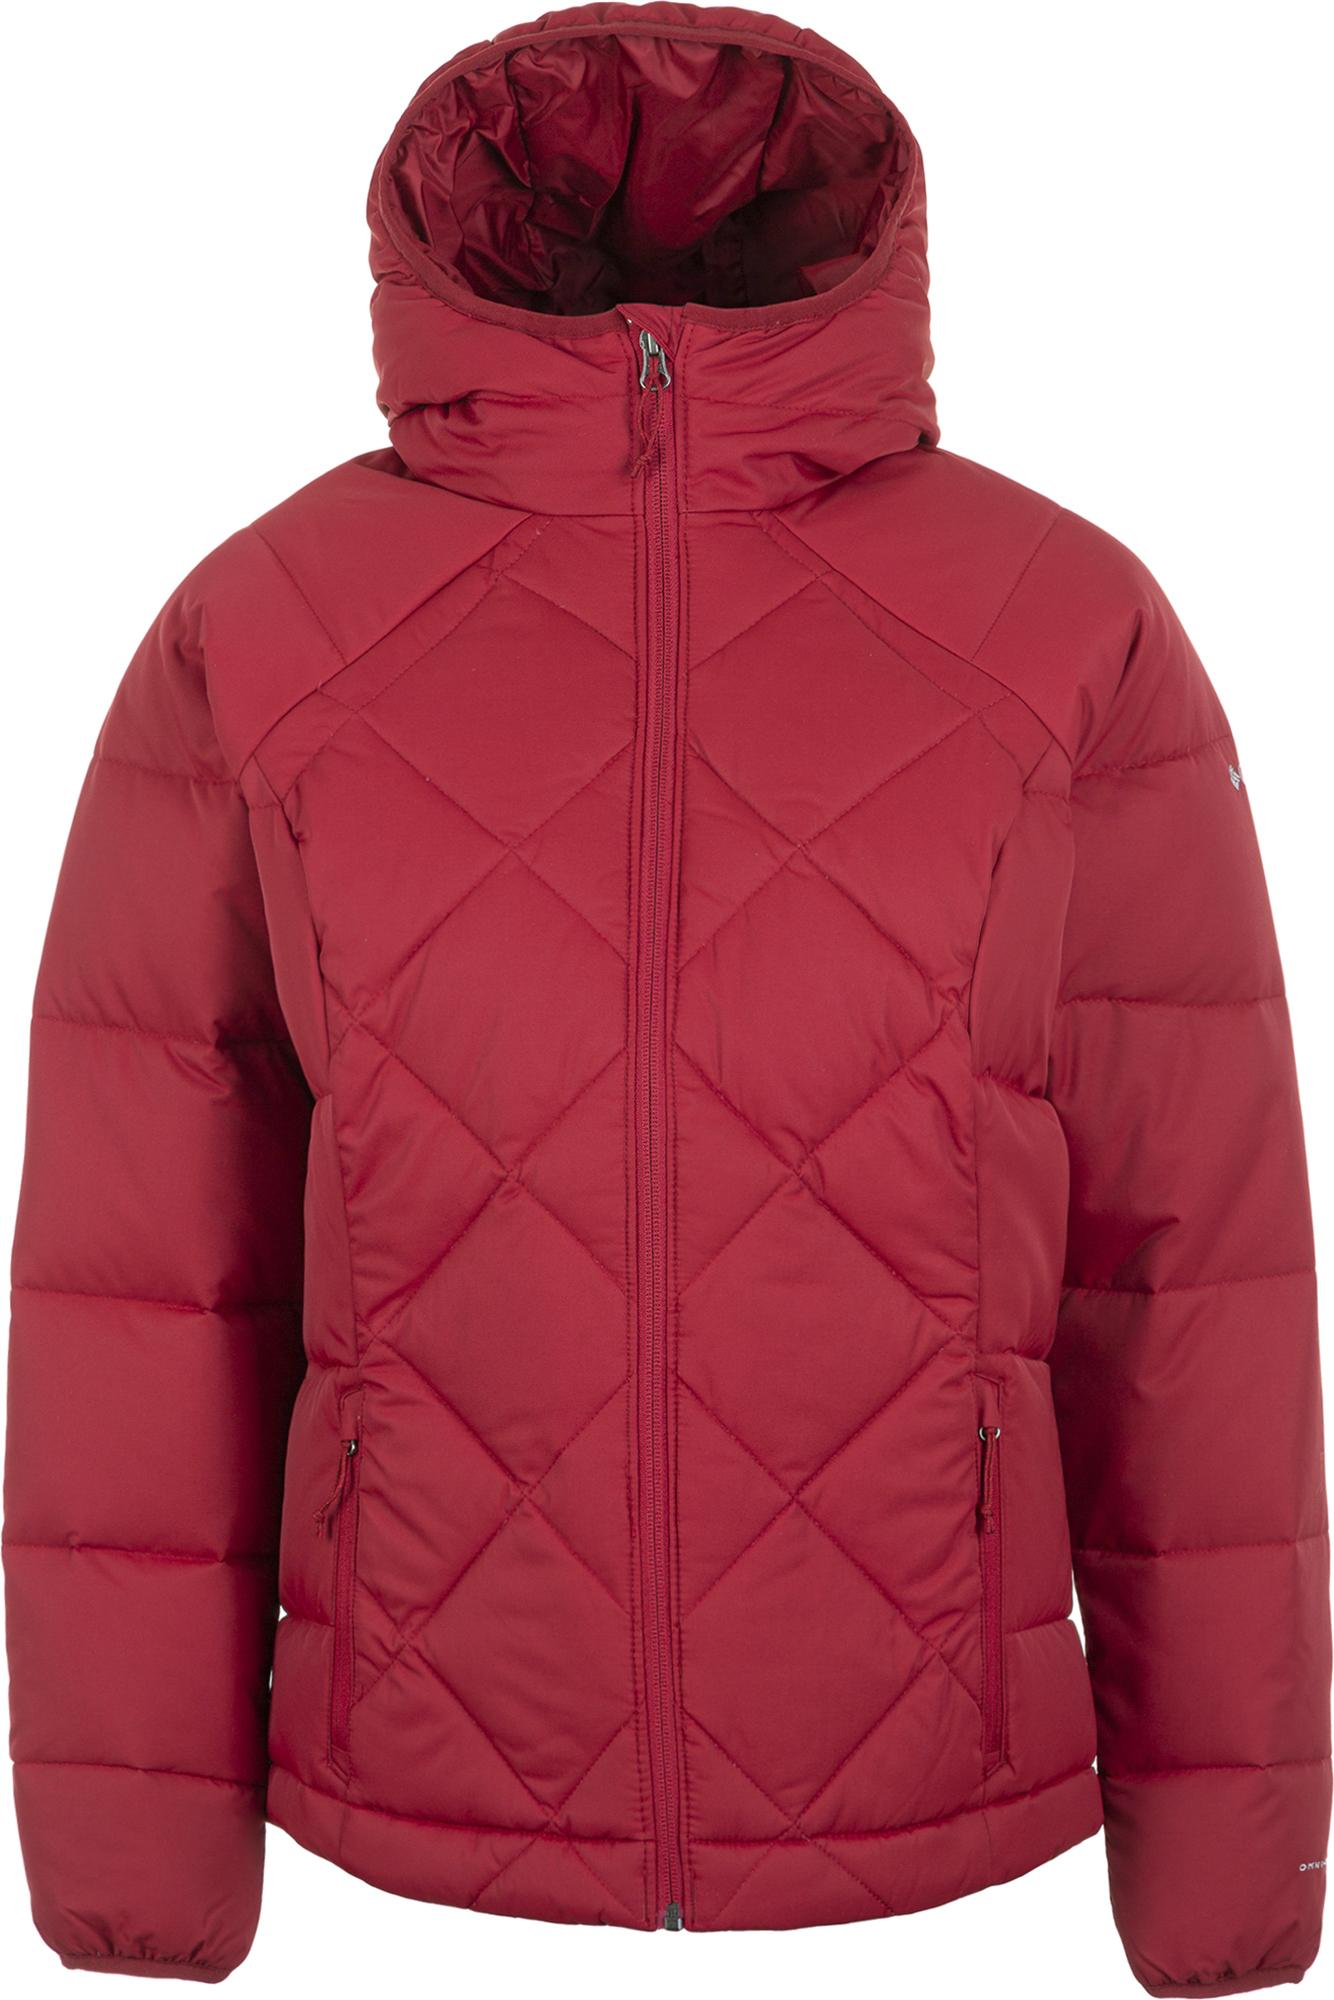 Columbia Куртка пуховая женская Ashbury, размер 50